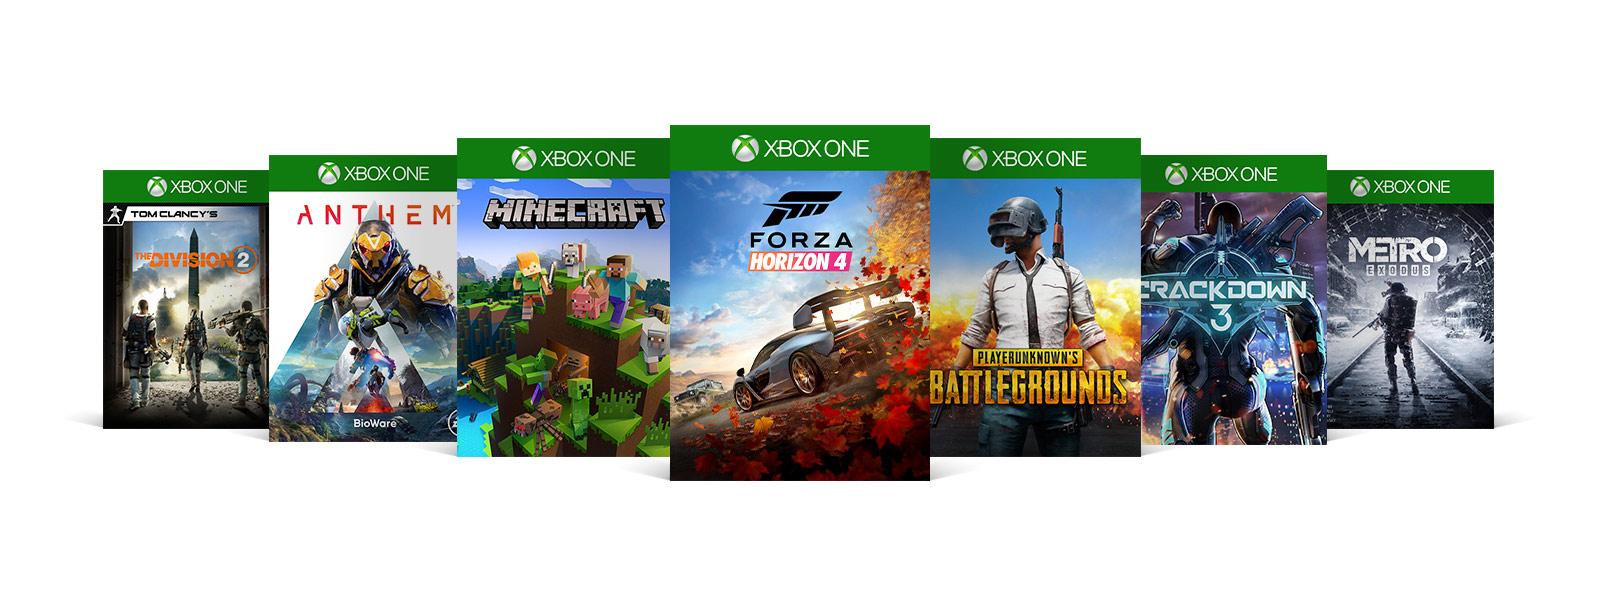 The Division 2, Anthem, Minecraft, Forza Horizon 4, PlayerUnknown Battlegrounds, Crackdown 3 and Mertro Exodus box shots